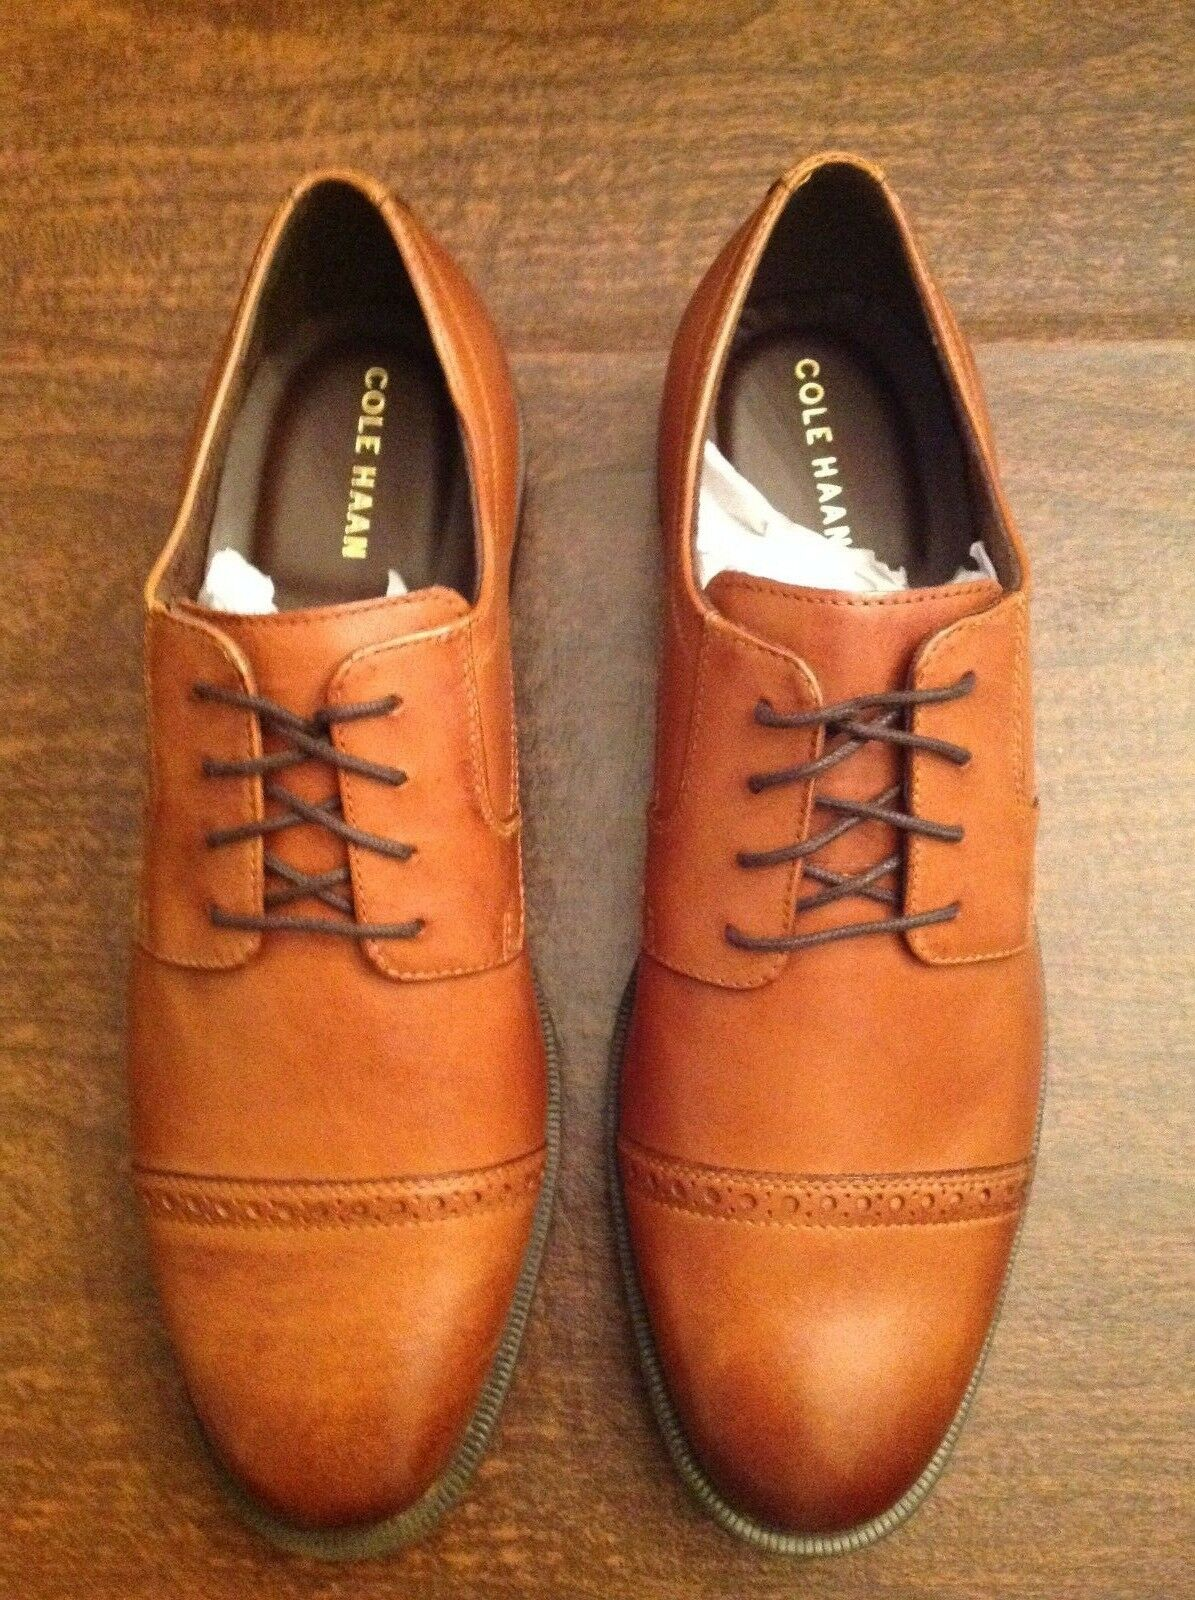 Cole Haan Men's Dustin Cap Toe Brogue Tan Leather Oxford Dress shoes 11.5M   NIB